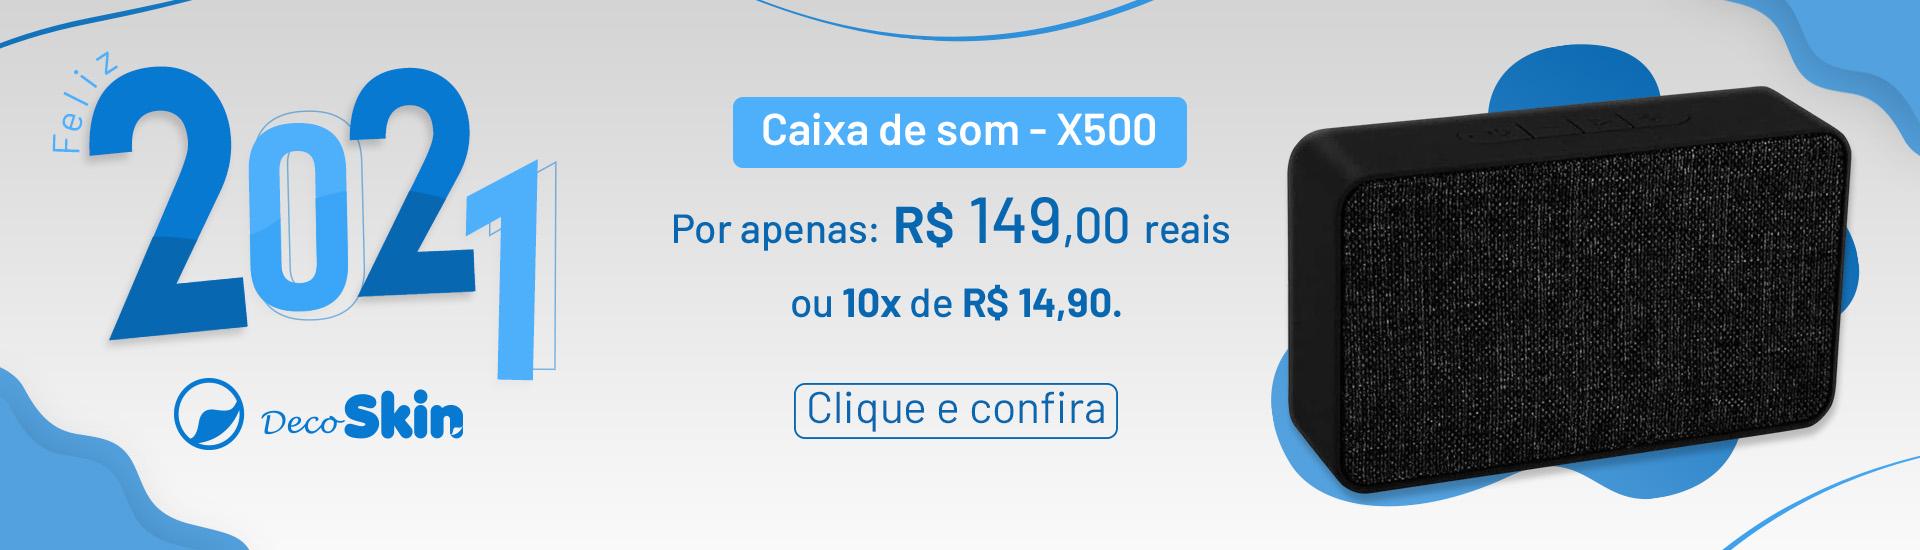 05 Caixa de Som X500 | Desktop 1920x550